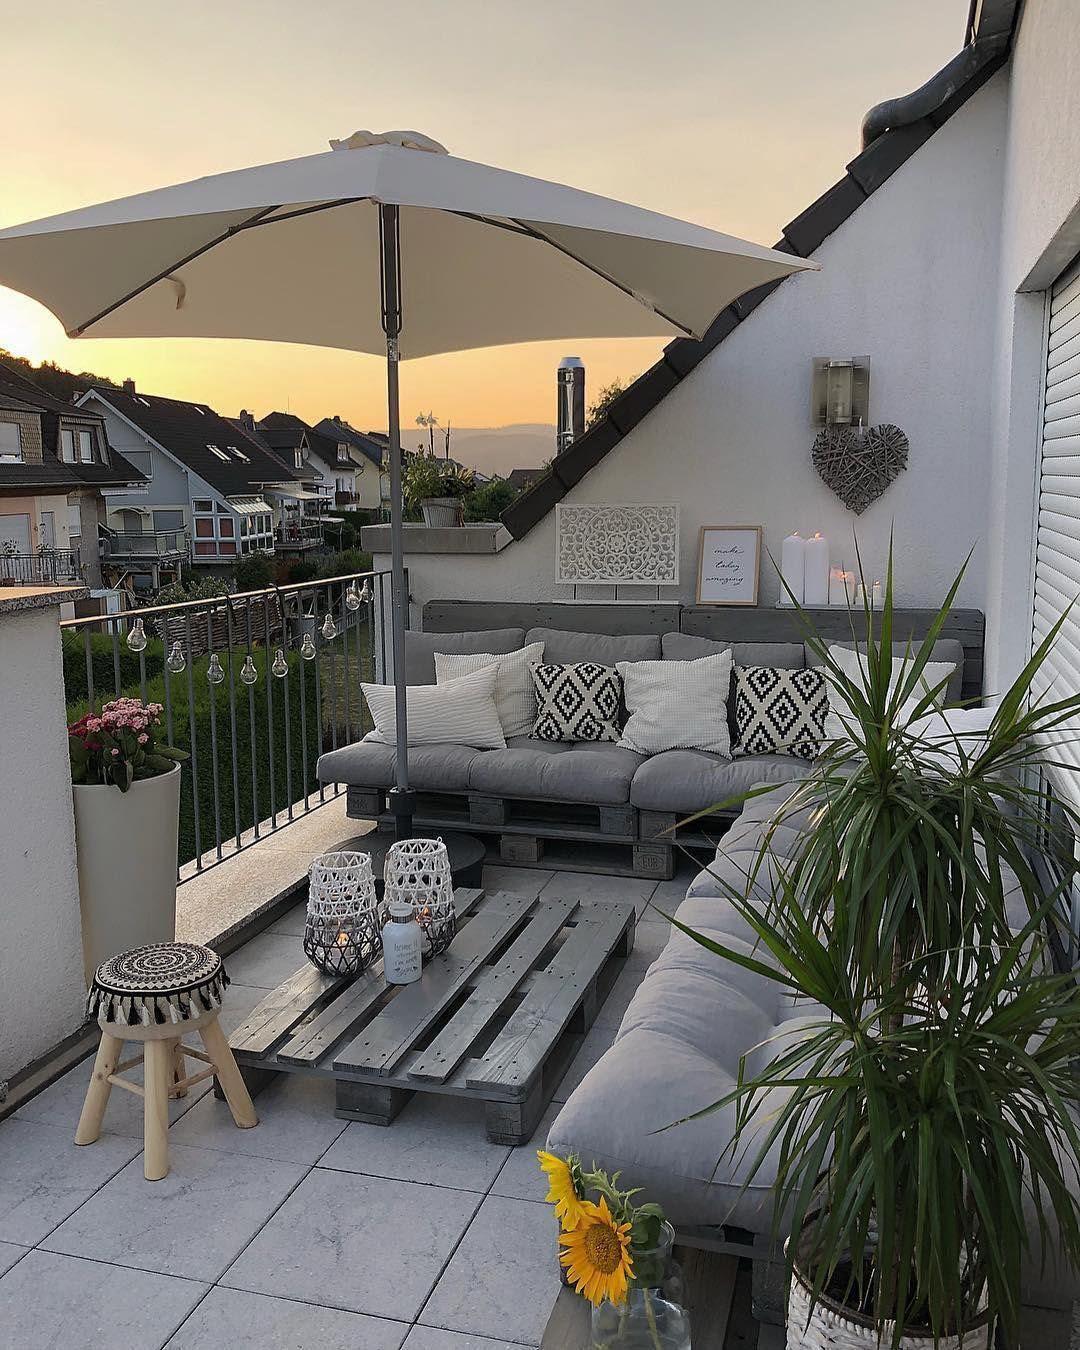 Gorgeous Balcony Garden Ideas Singapore Tips For 2019 Balcony Decor Apartment Balcony Decorating Balcony Design